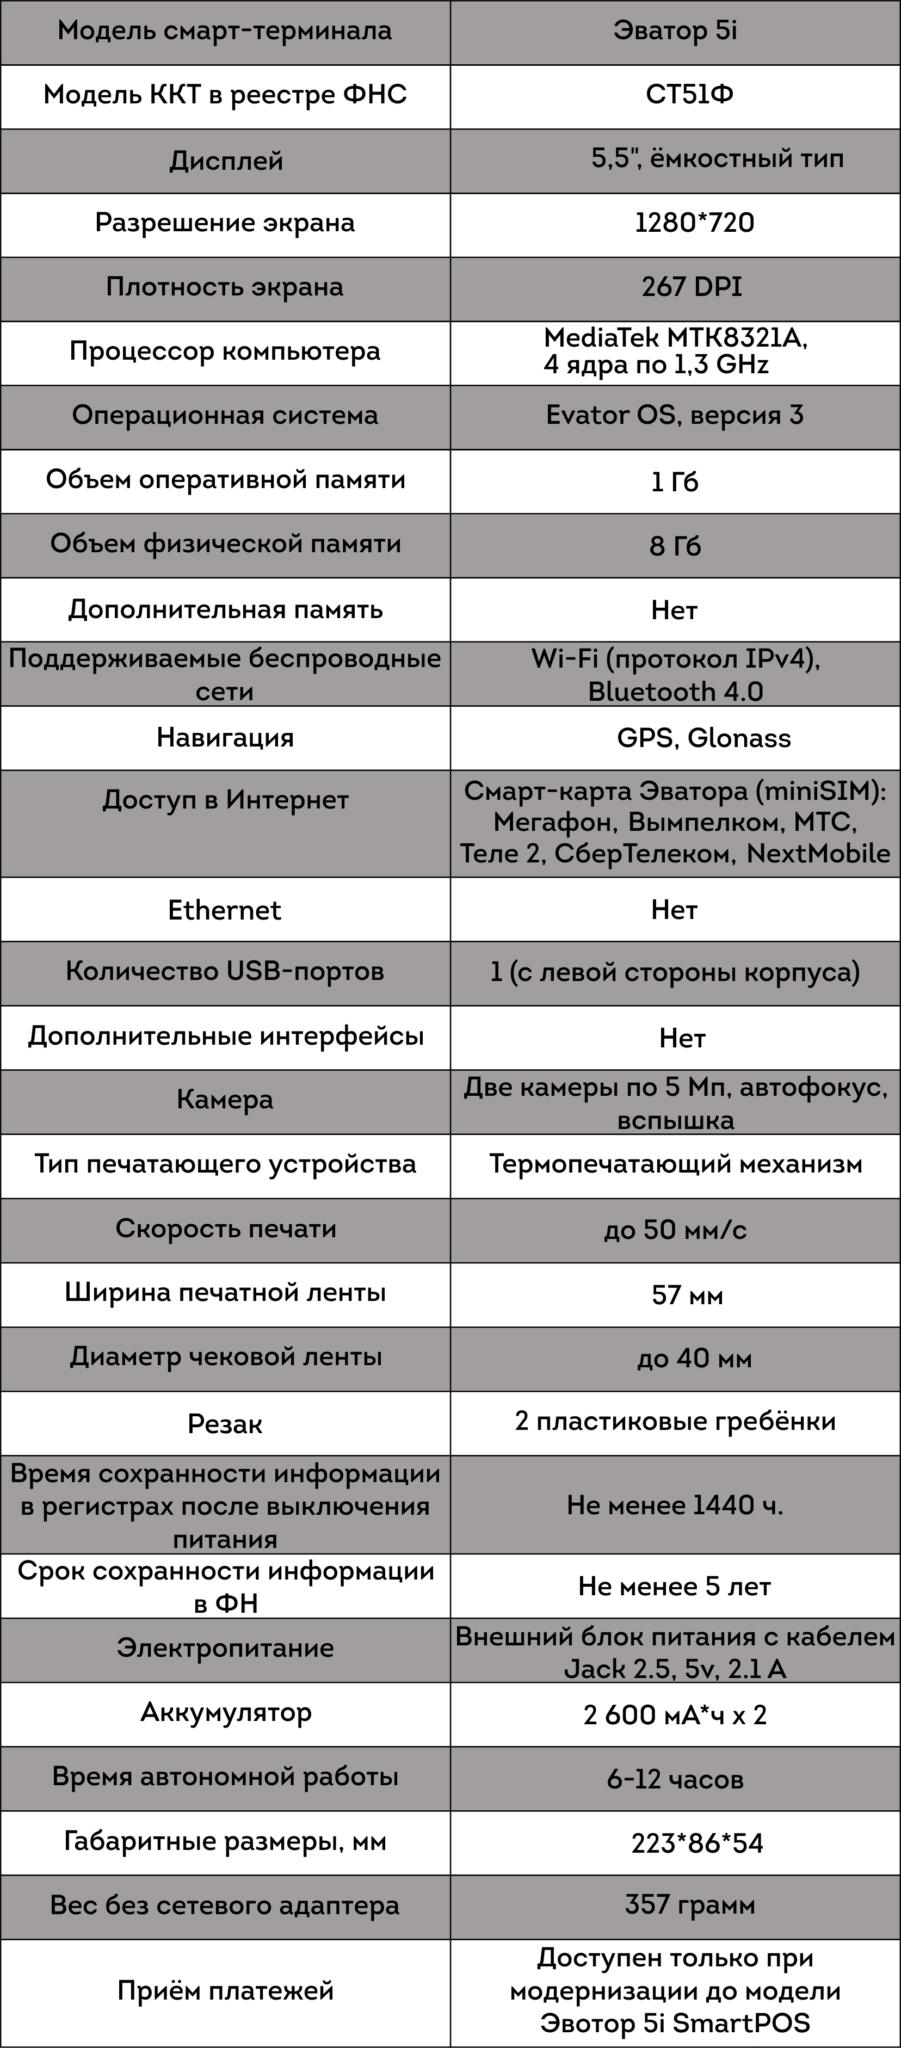 Эвотор 5i